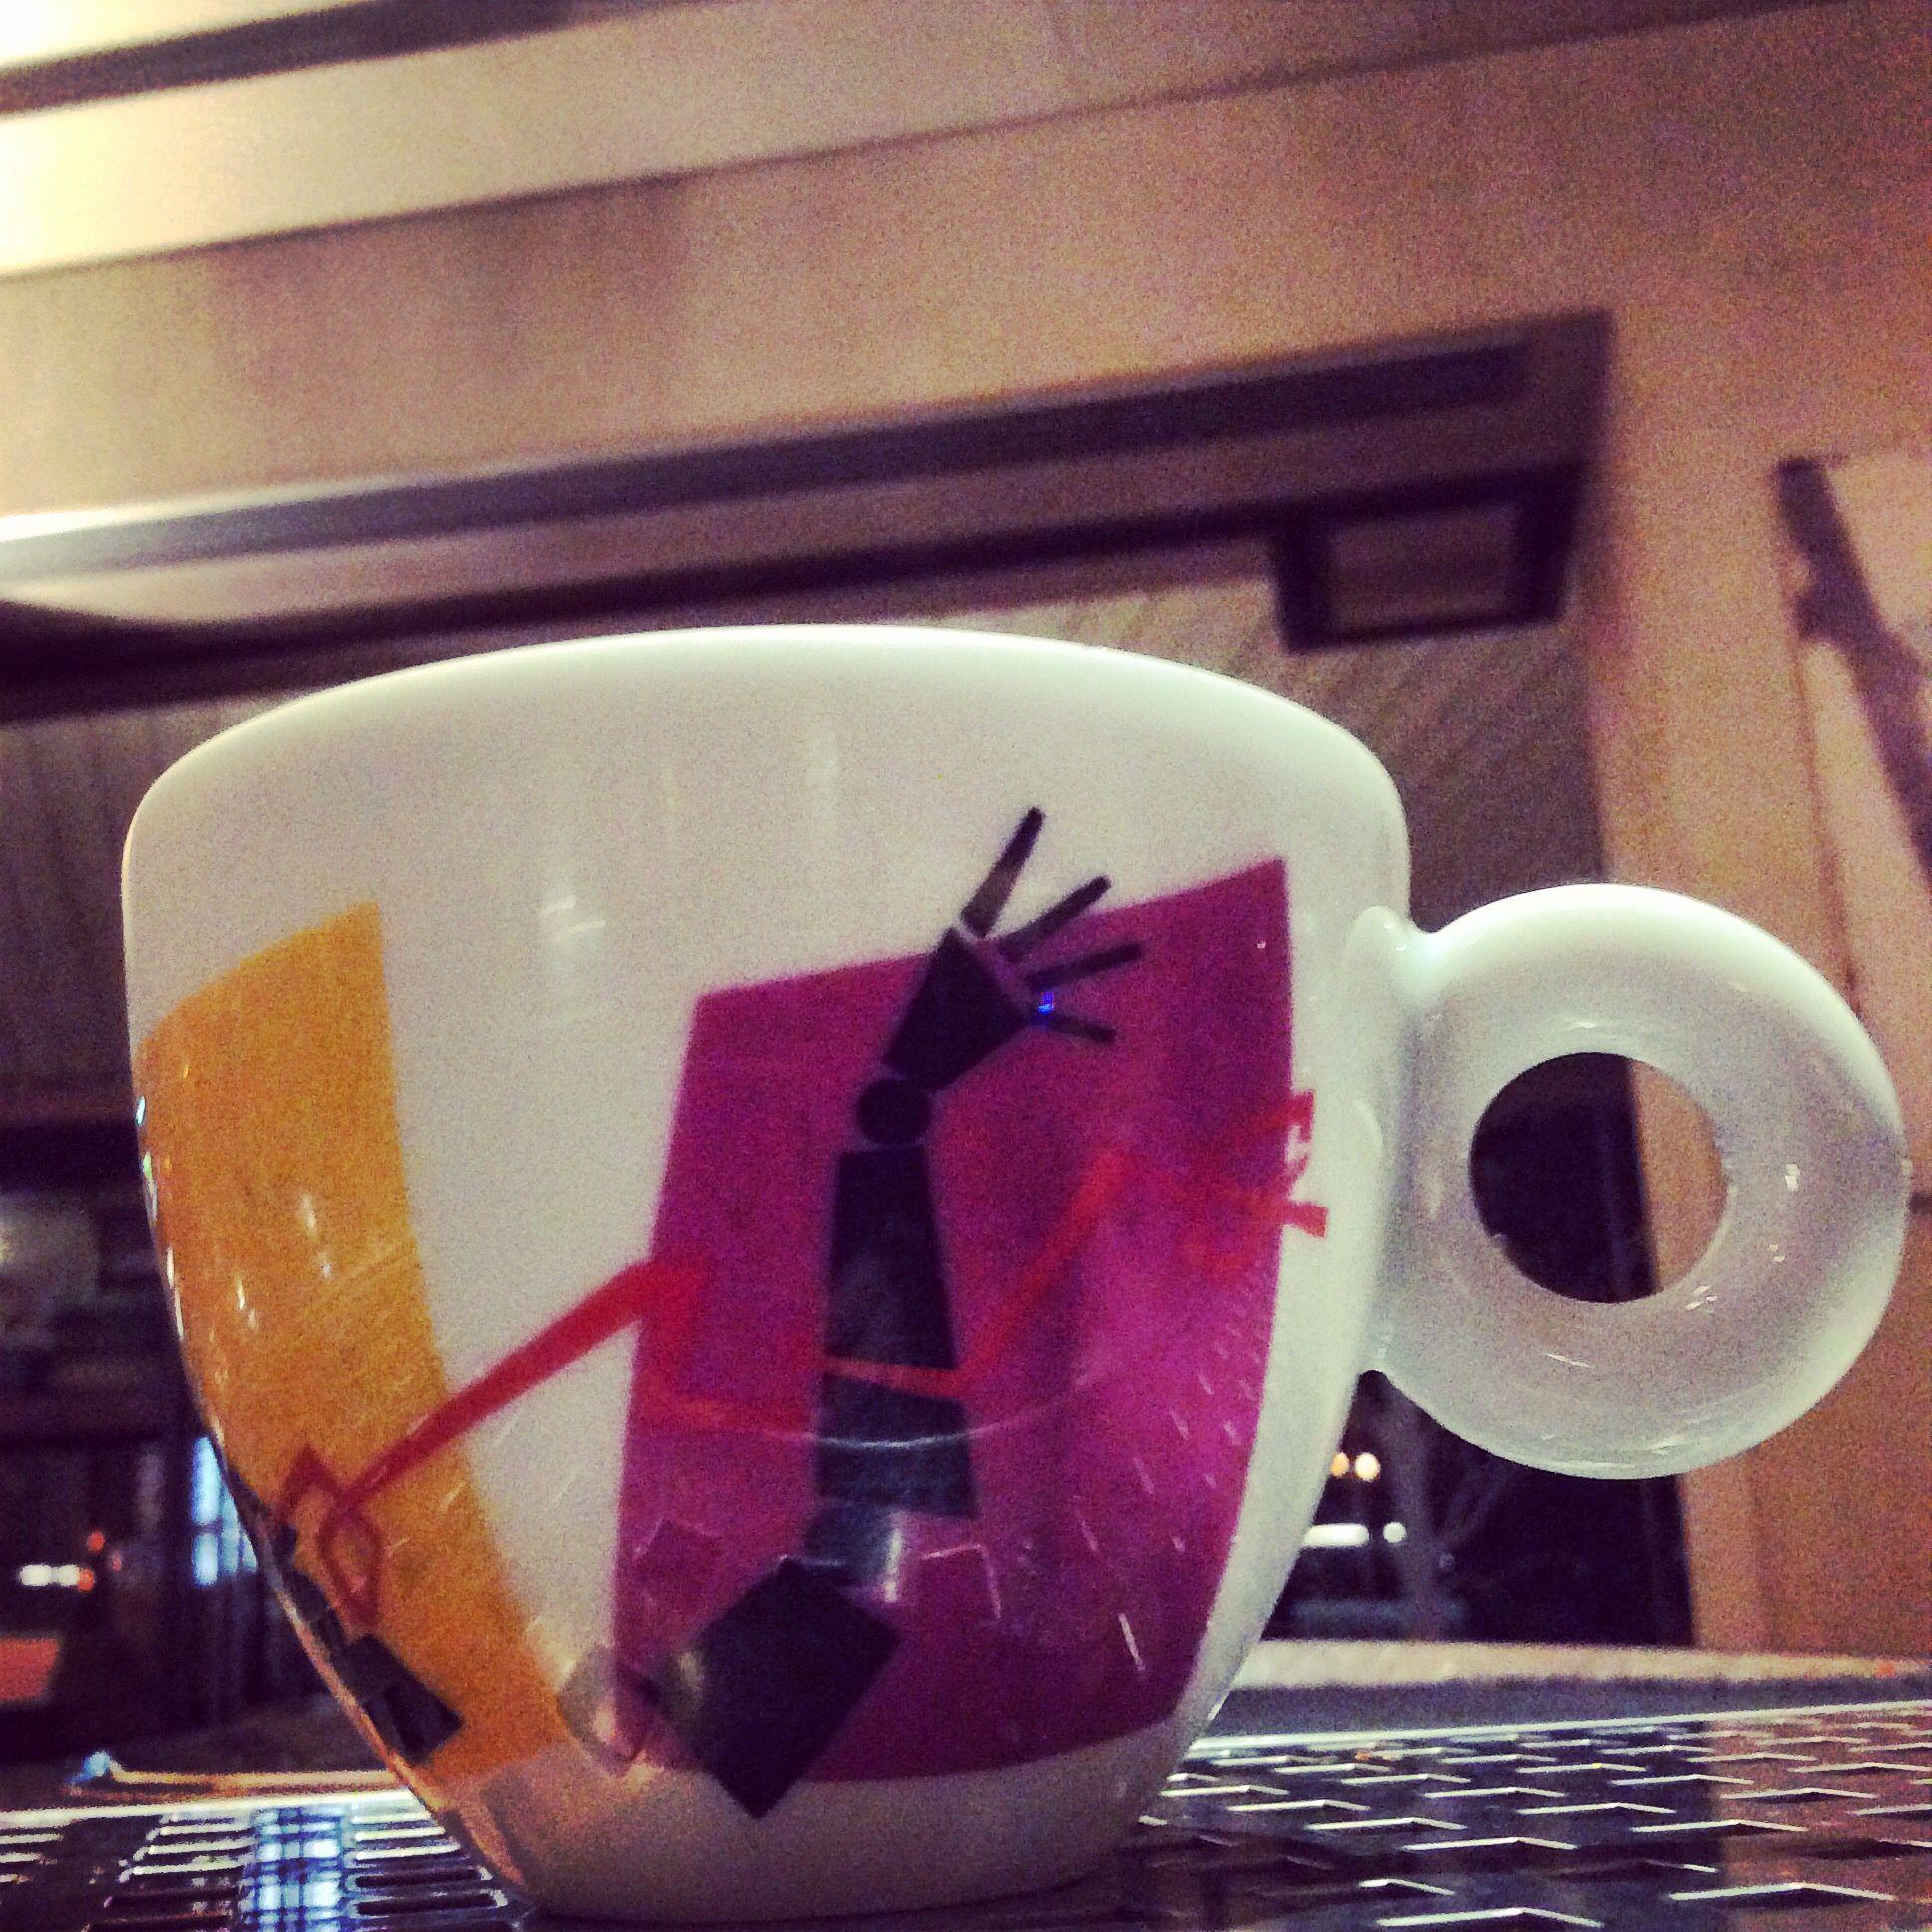 #Breezecafe#illy#illycafe#illyartcollection#pedroalmodovar#cappuccino#espresso#cafe#coffee